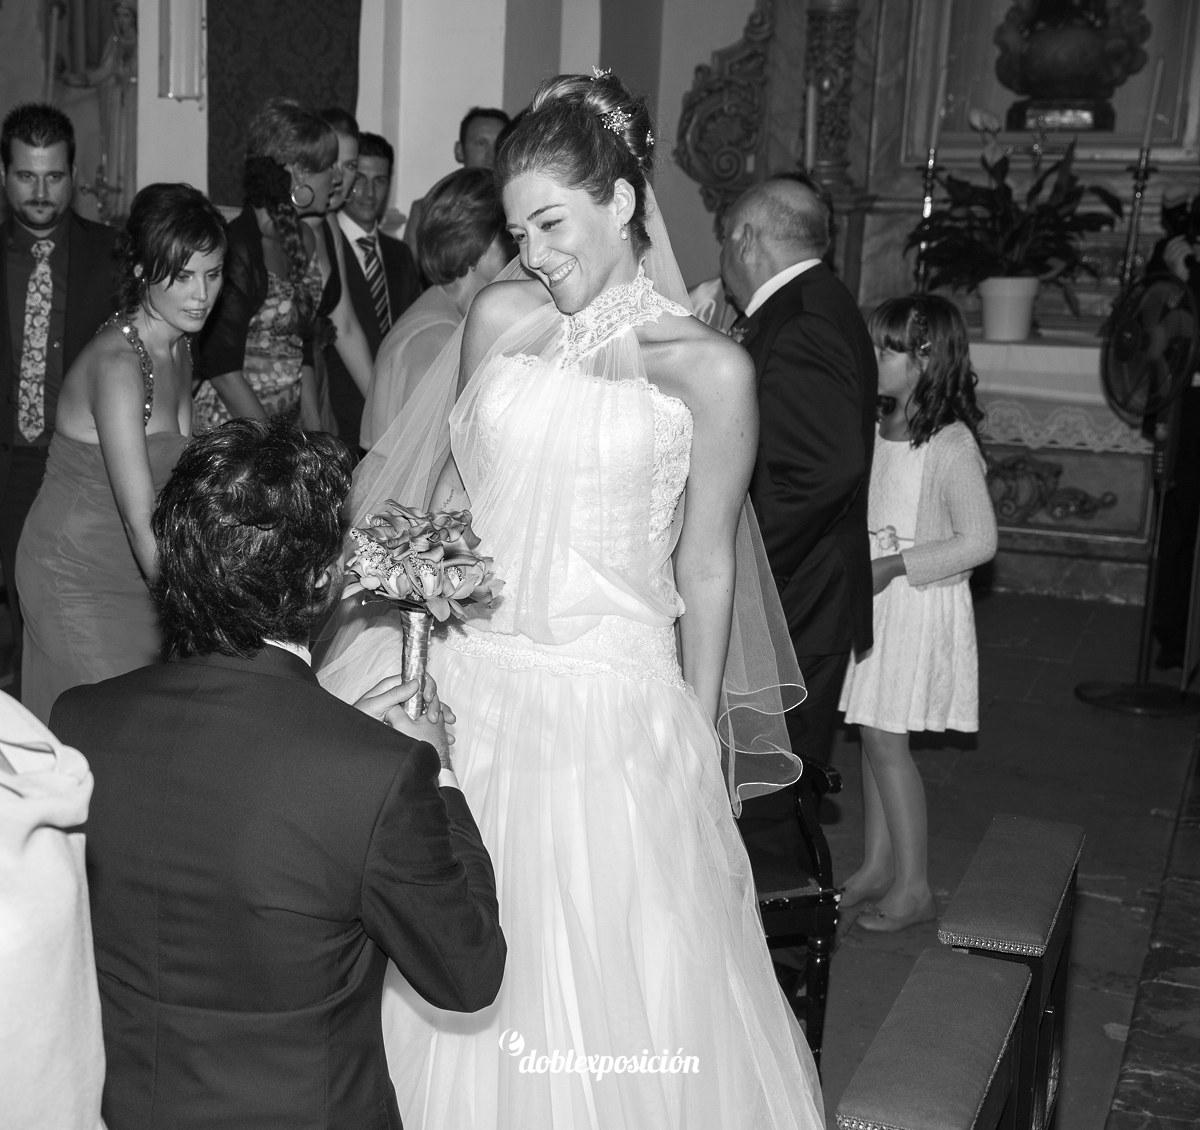 fotografos-boda-finca-jardines-de-abril-alicante_0009